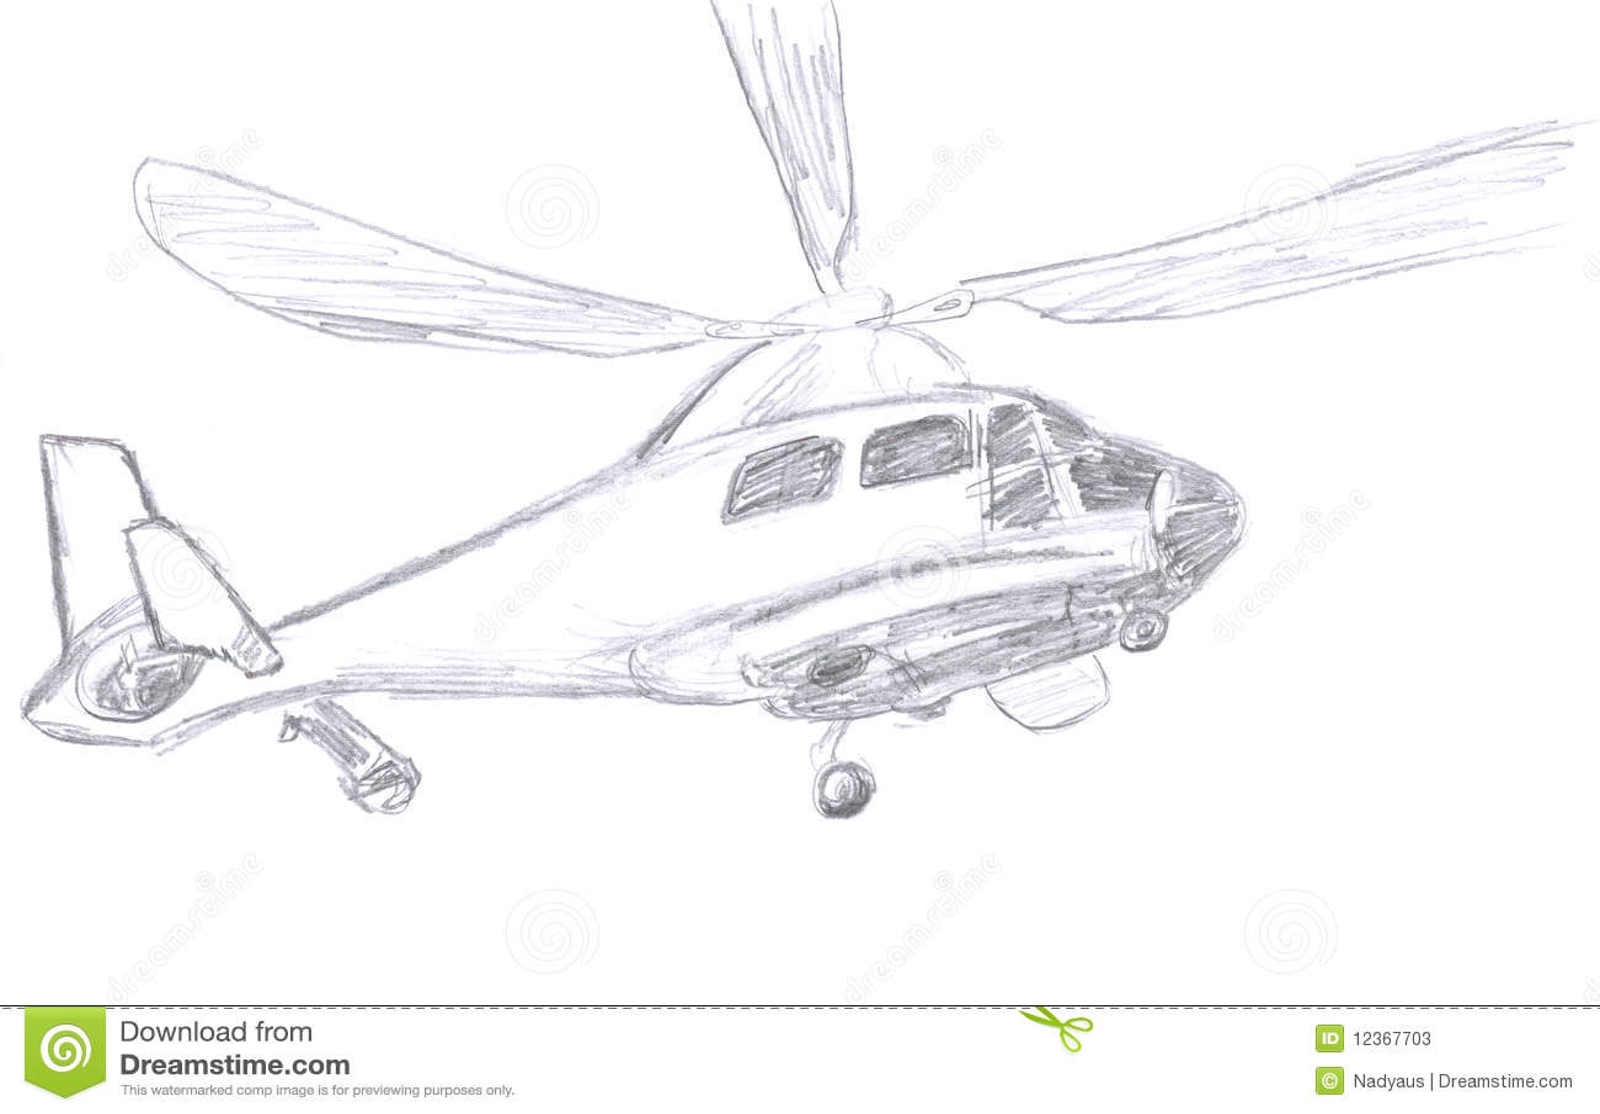 Helicopter Sketch Stock Illustration Illustration Of